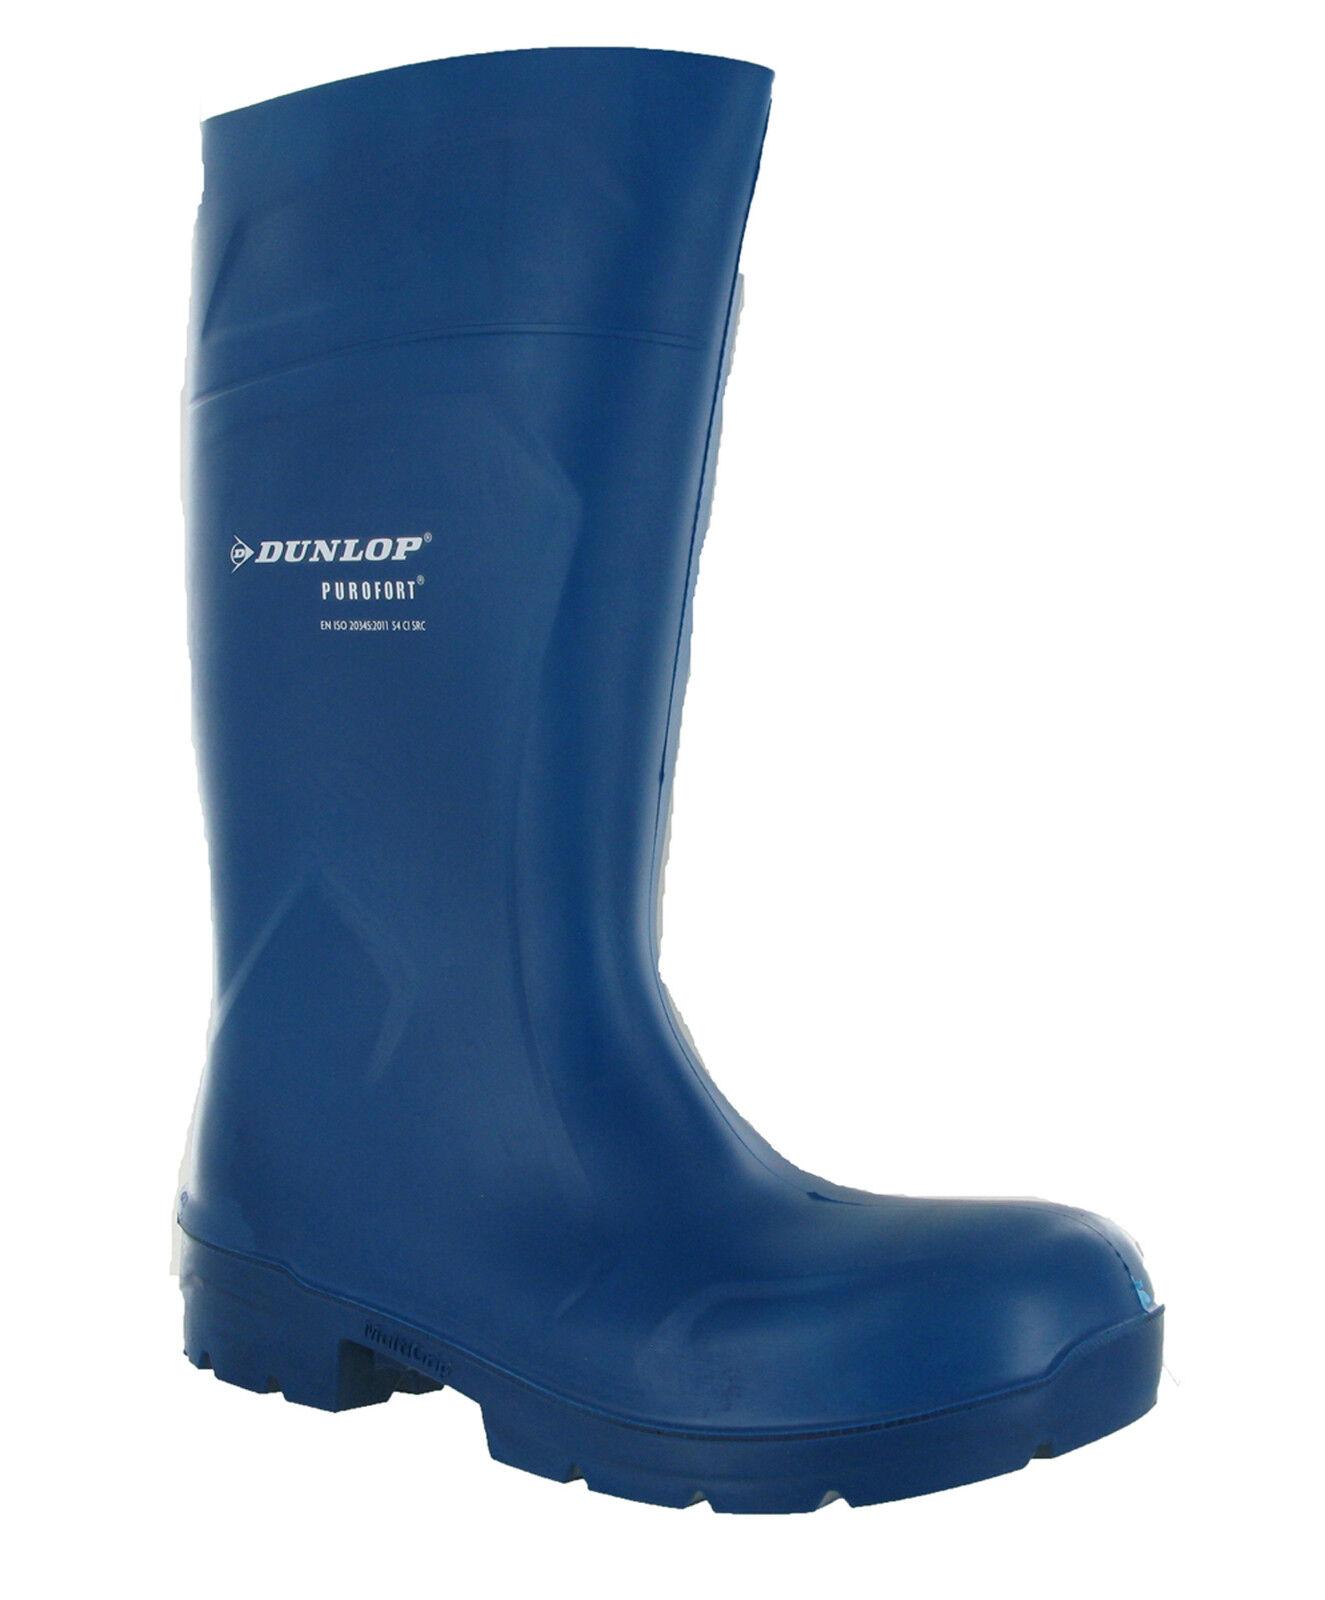 eac1e418367 Dunlop Purofort Food Pro Blue Multigrip S4 Safety Mens Wellington Boots  UK3-15